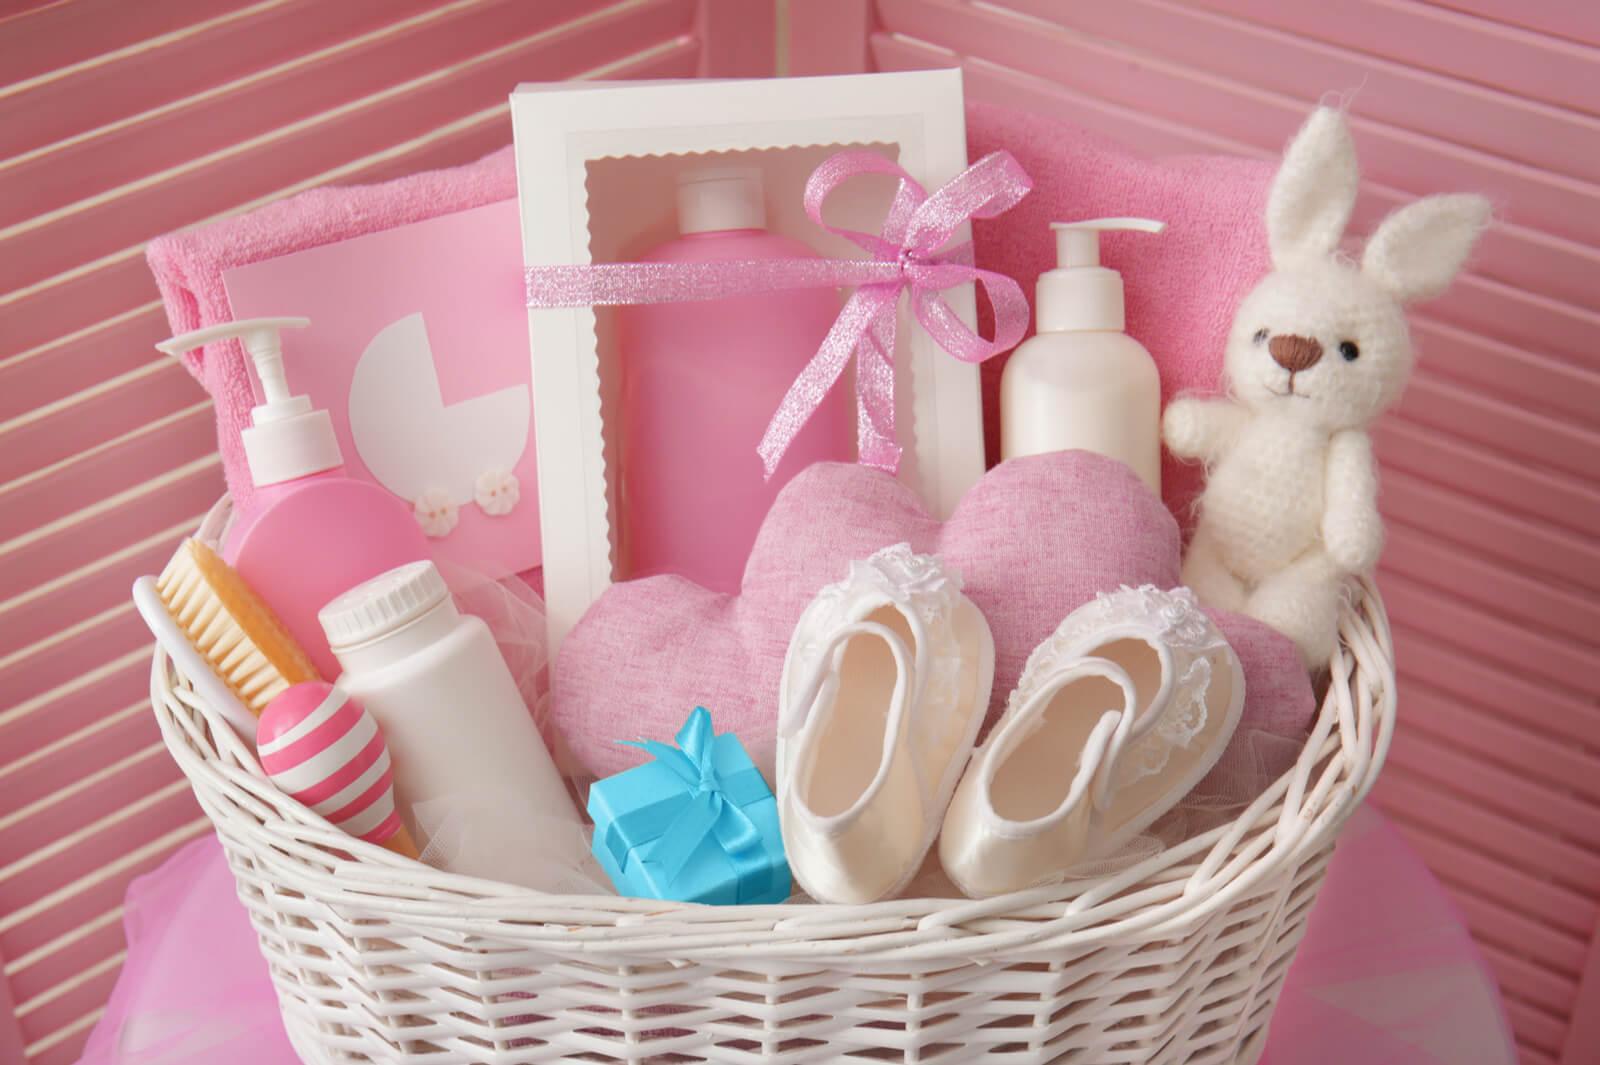 5 Ide Kado untuk Bayi Baru Lahir yang Berguna bagi Orangtua Baru